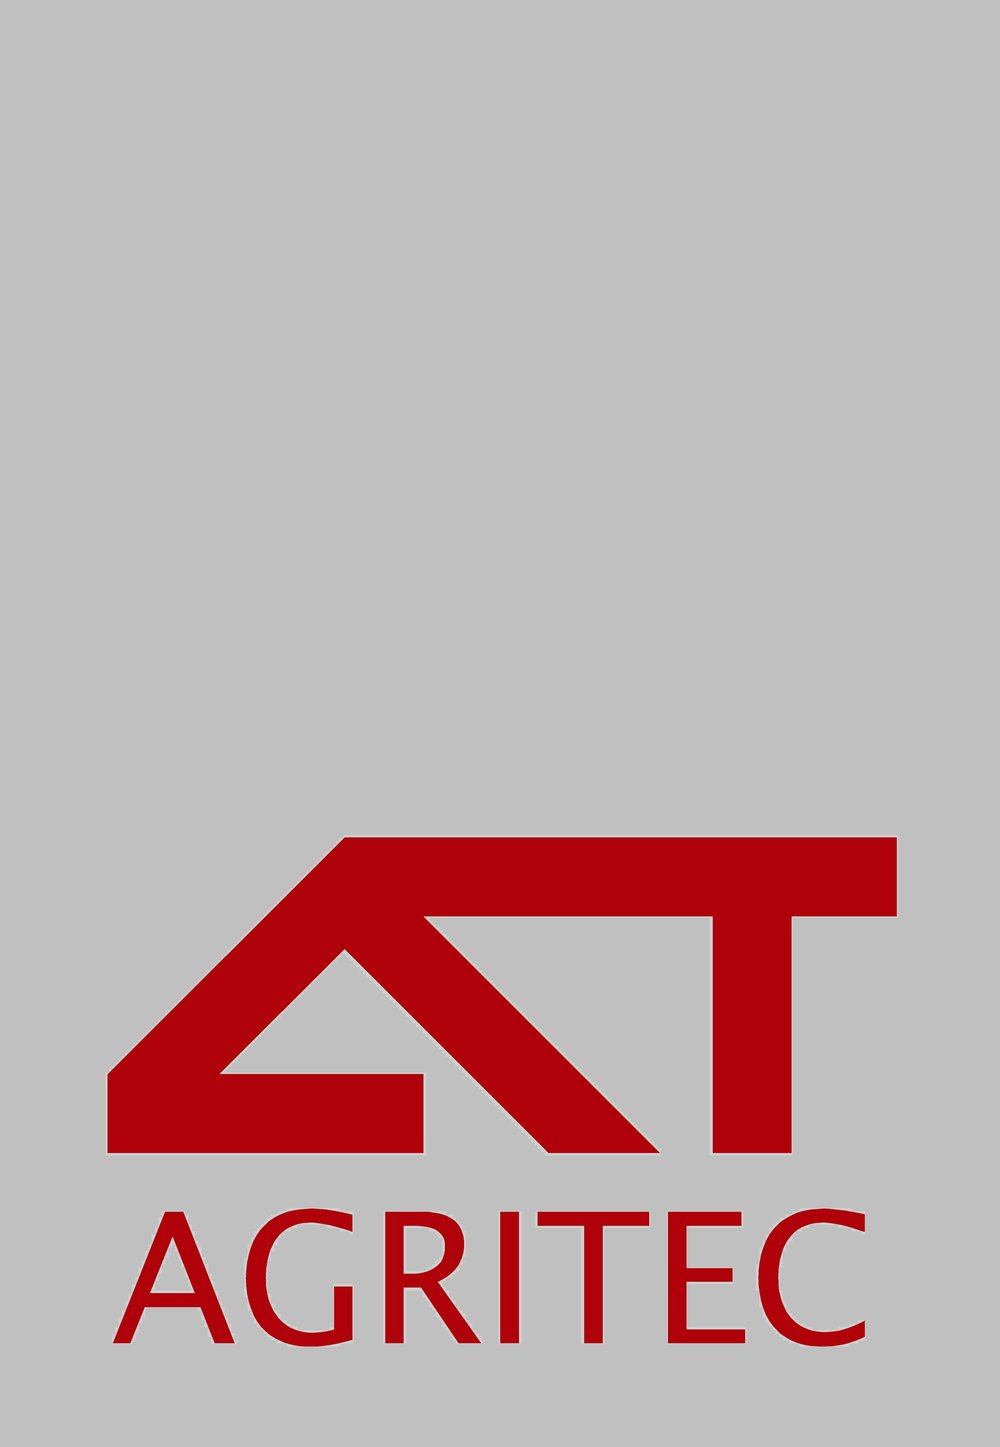 AGRITEC-Logo.JPG